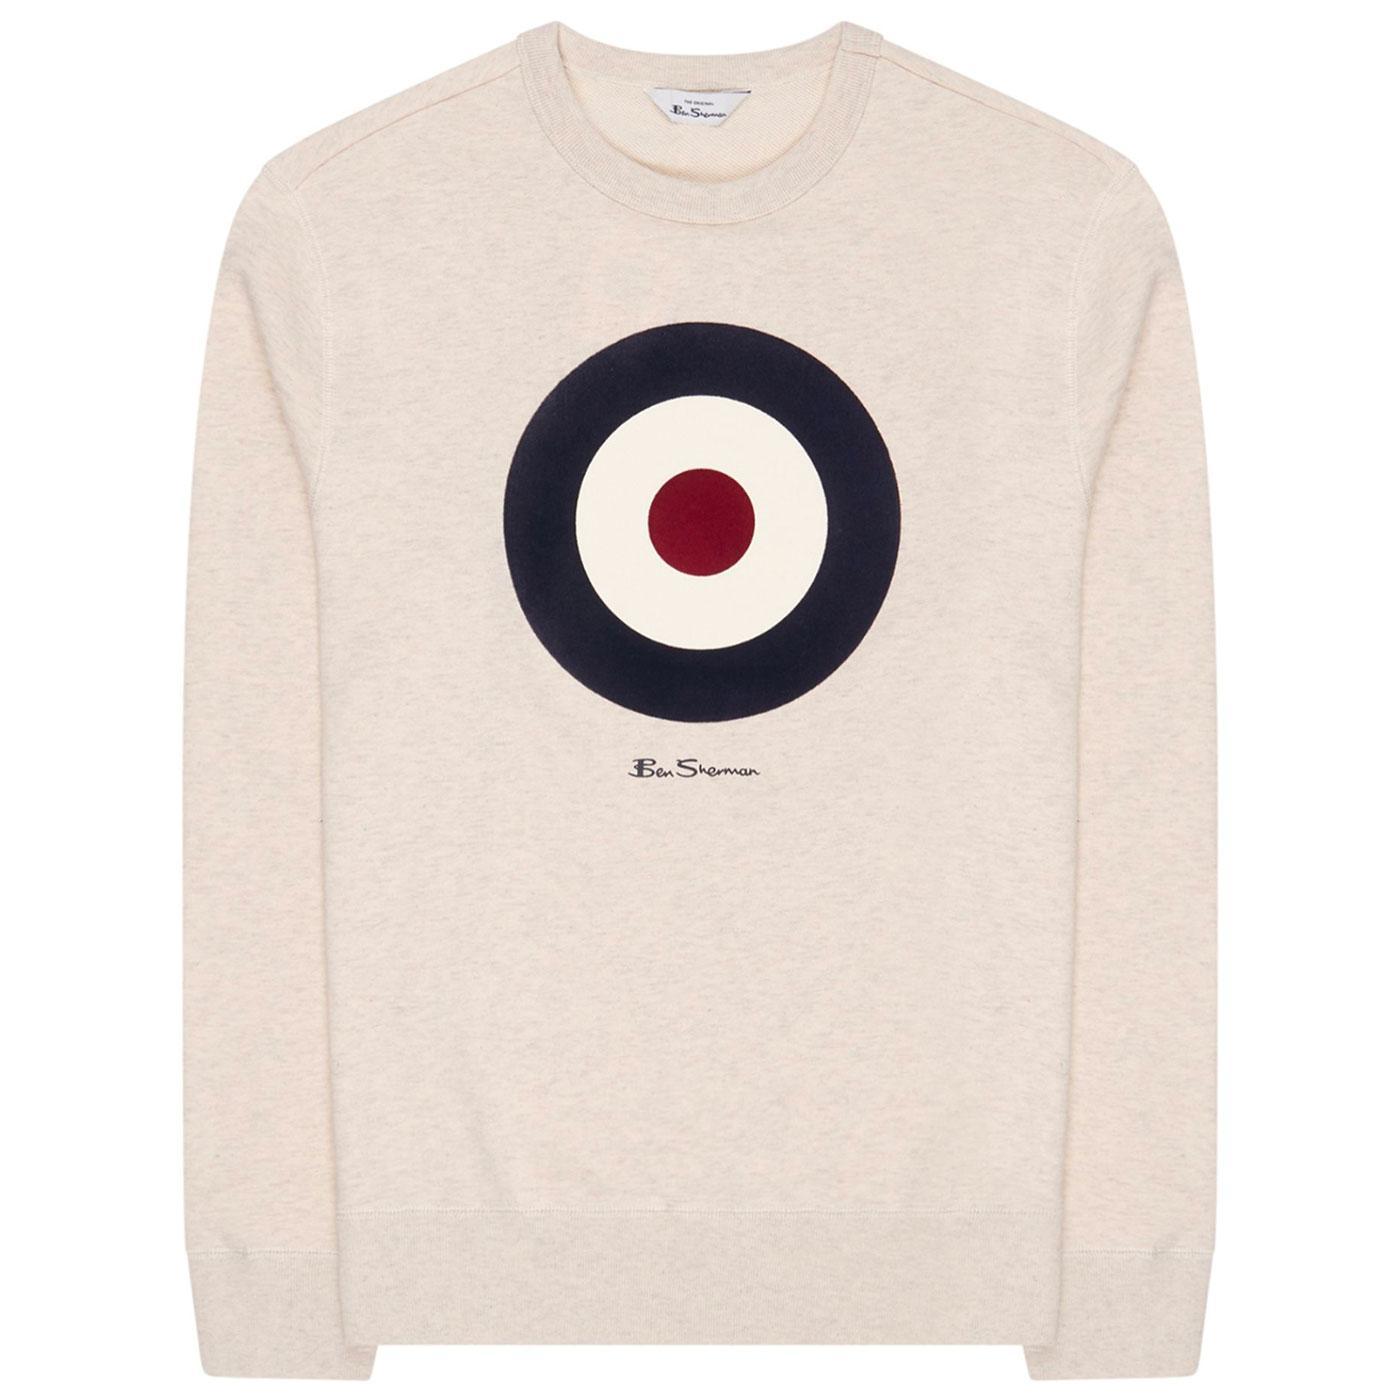 BEN SHERMAN Mod Target Signature Sweatshirt (Ecru)